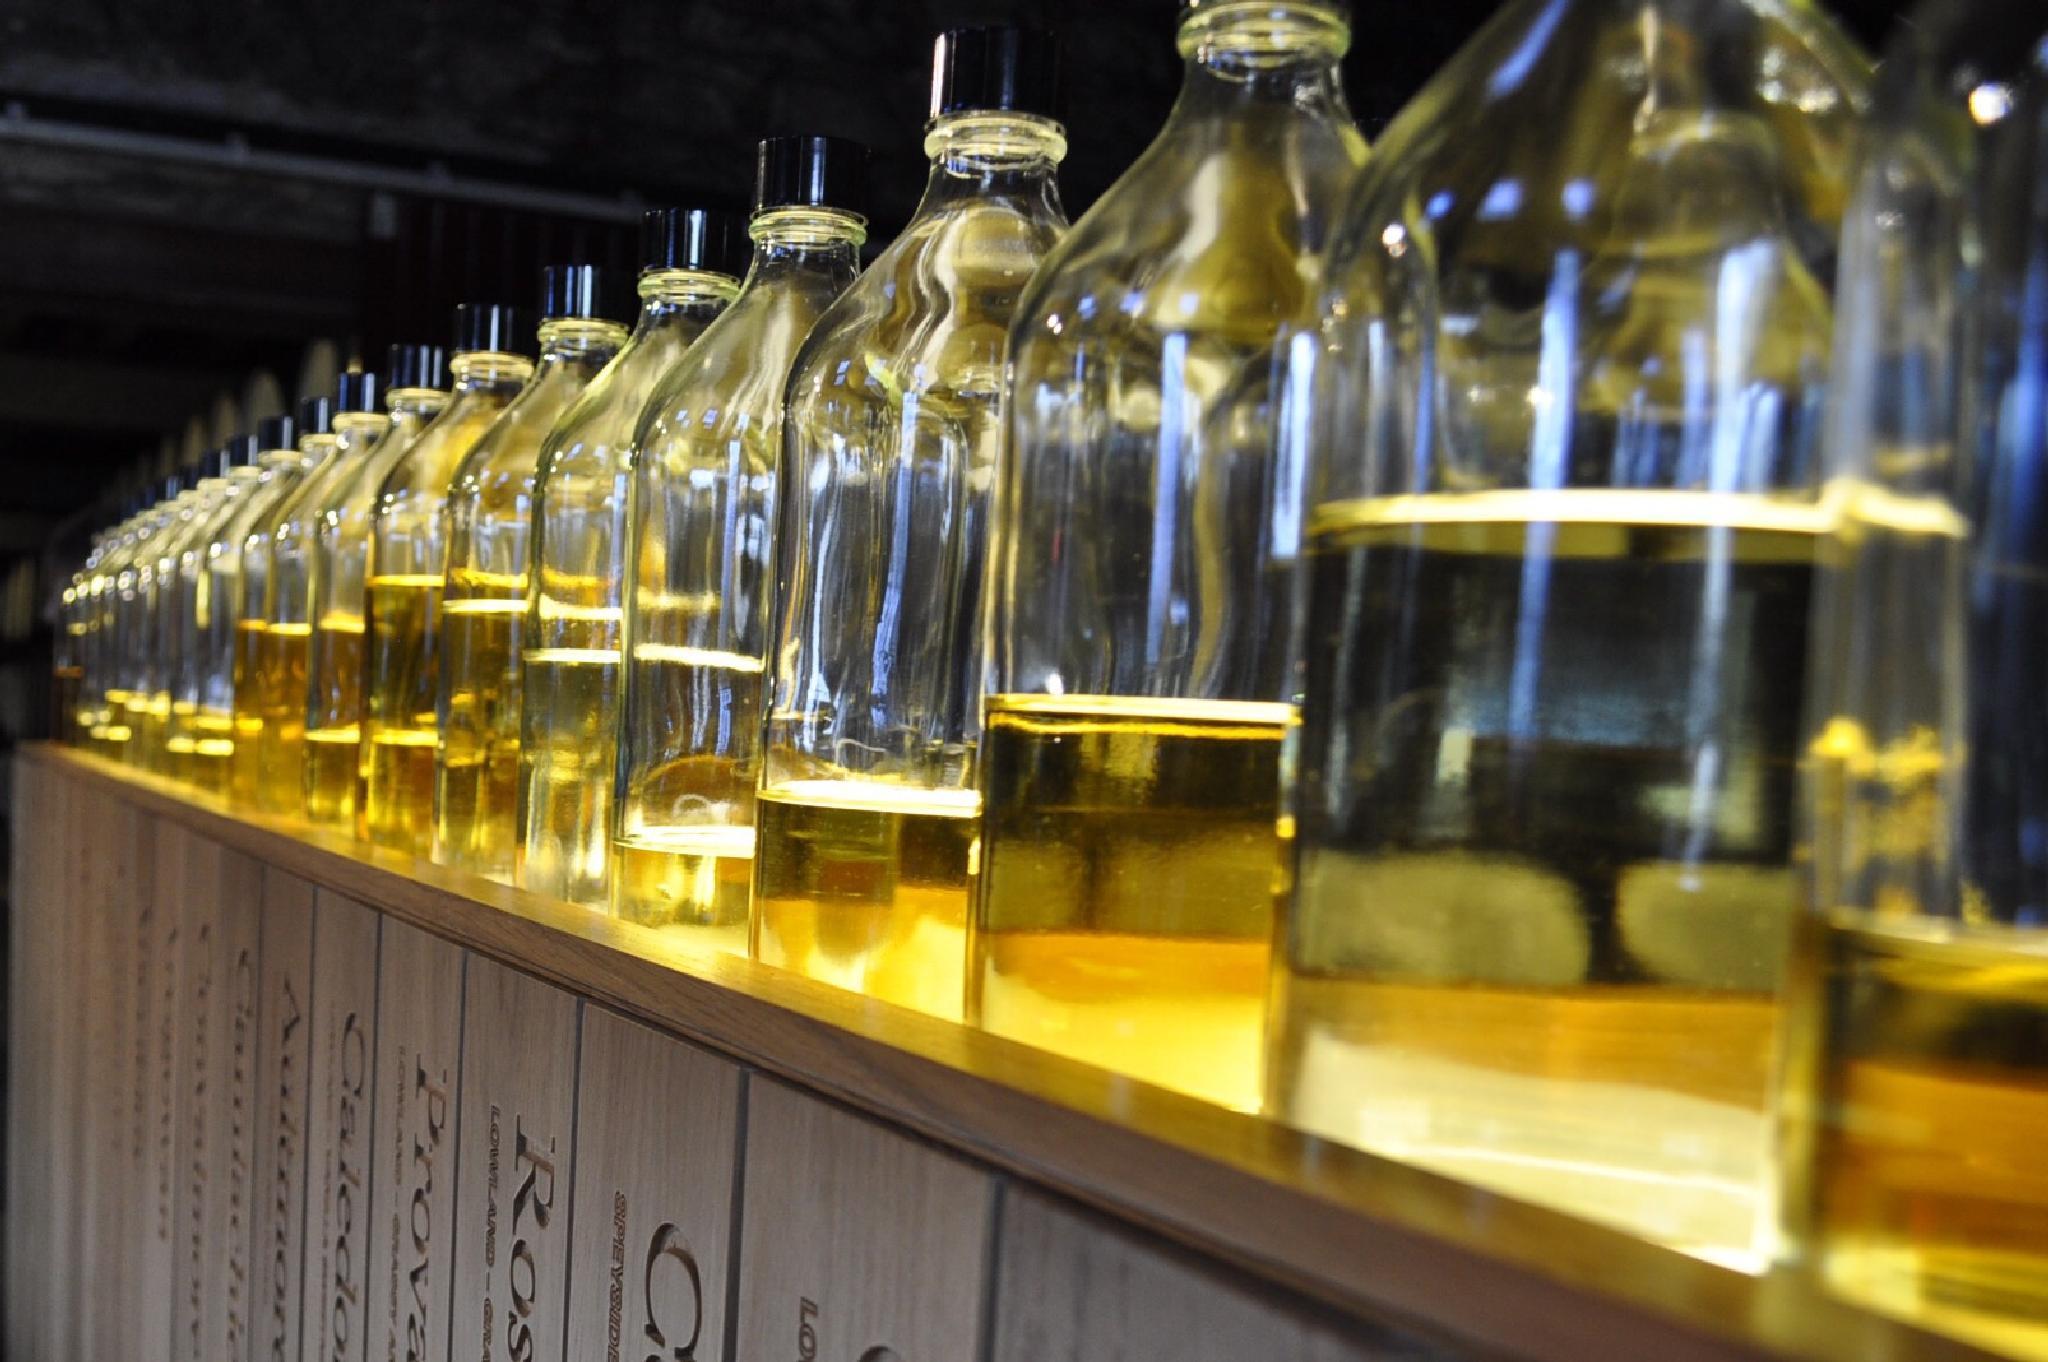 Whisky anyone? by Susan Swearengin